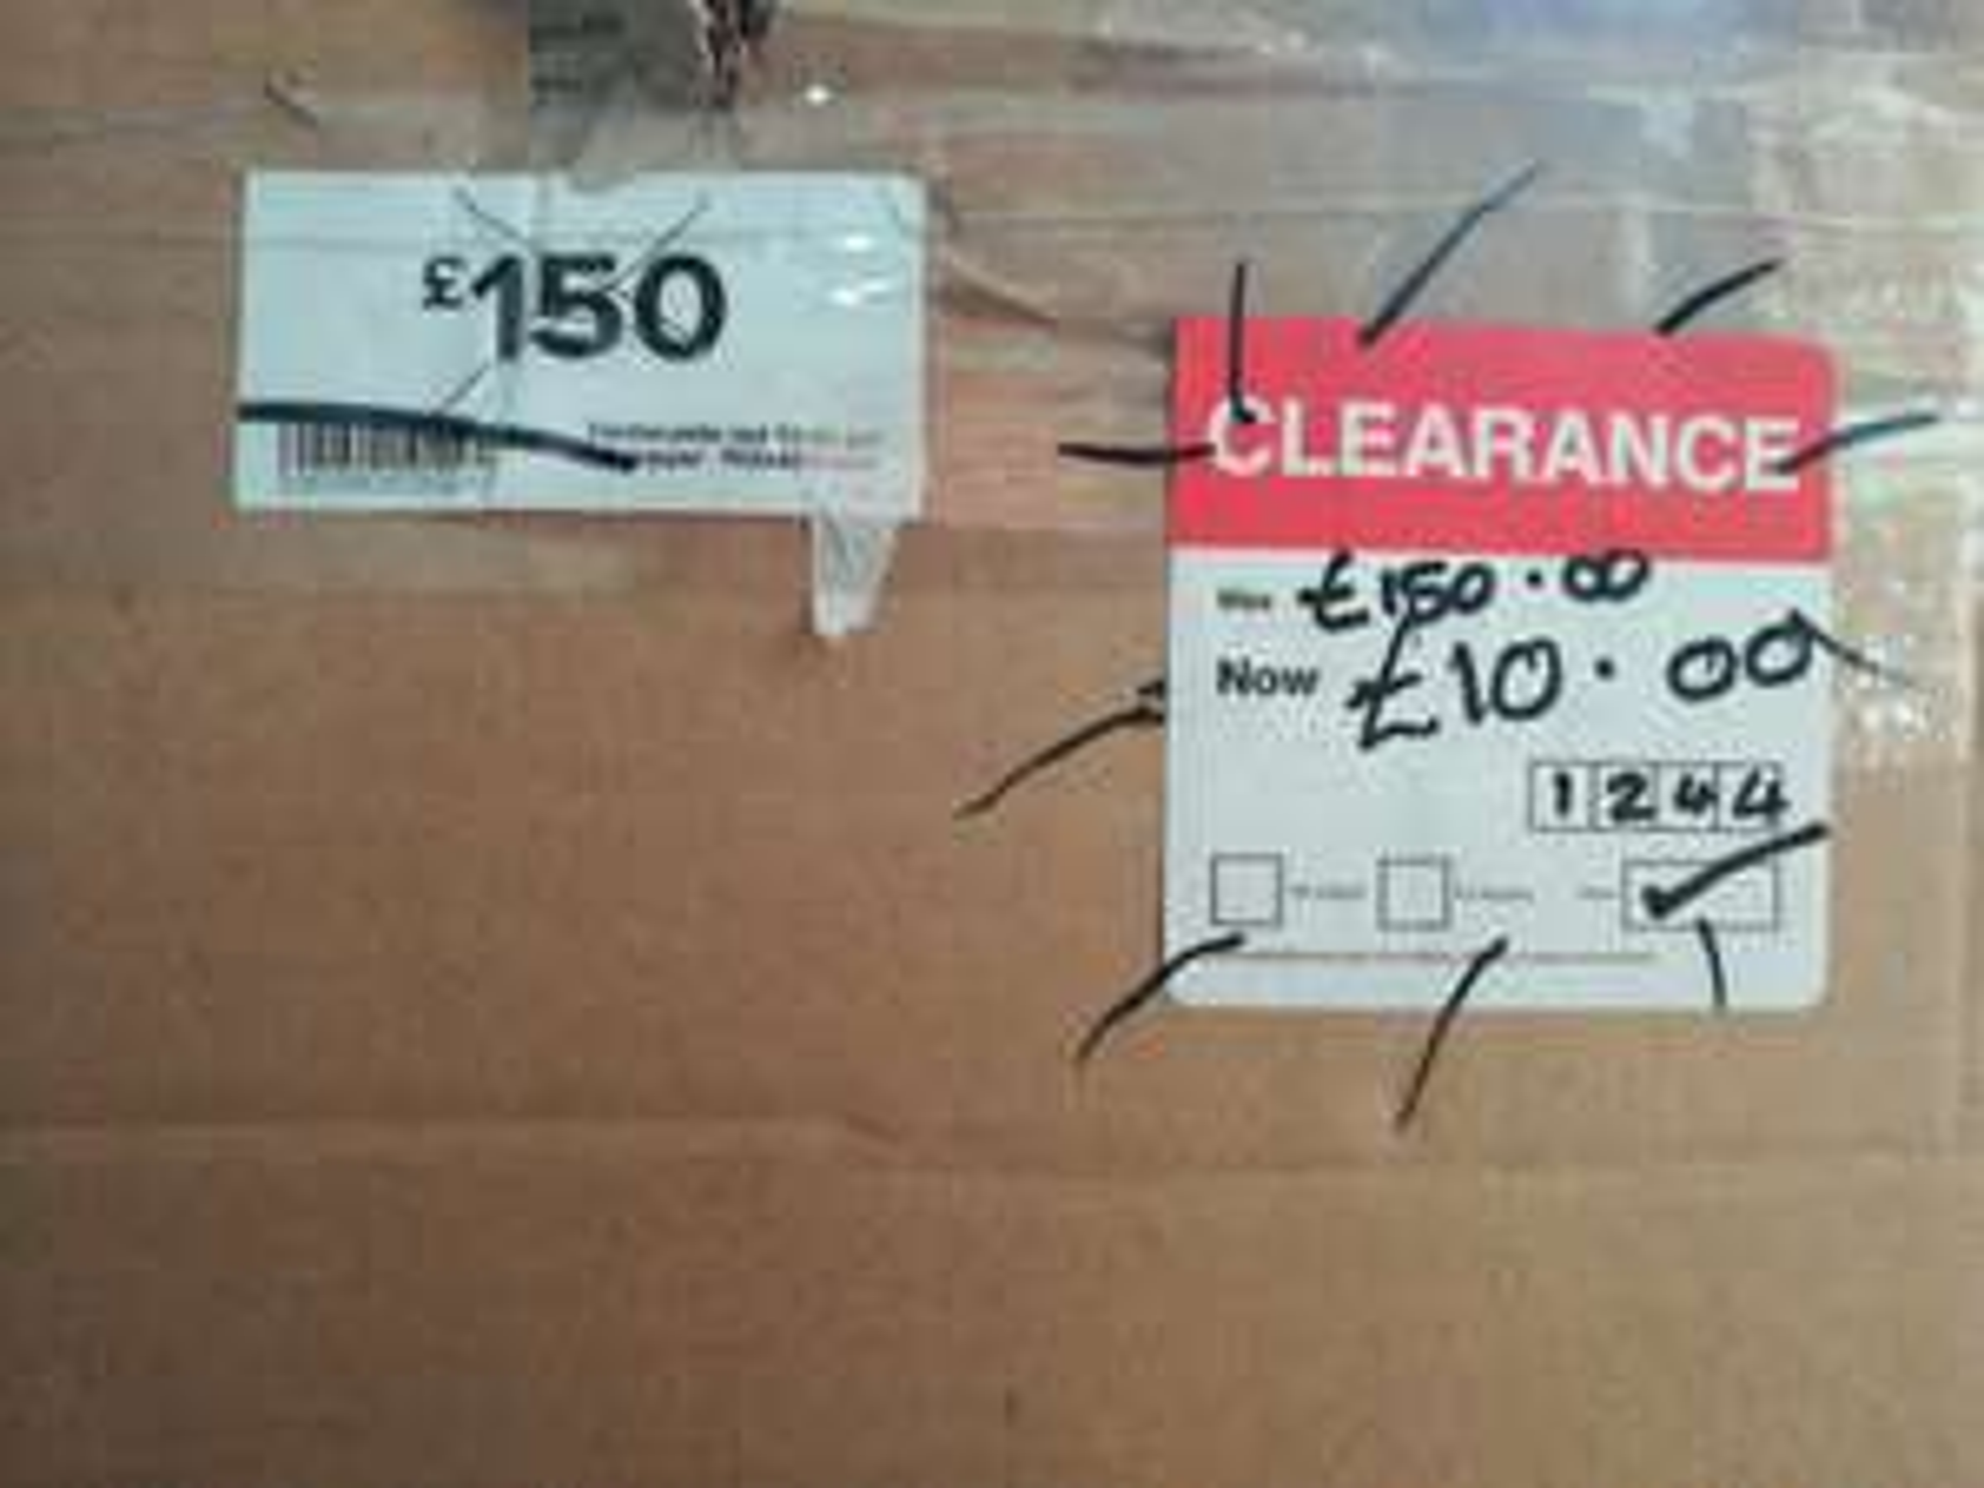 Discounts in Norwich B&Q e.g towel rail £10 was £150